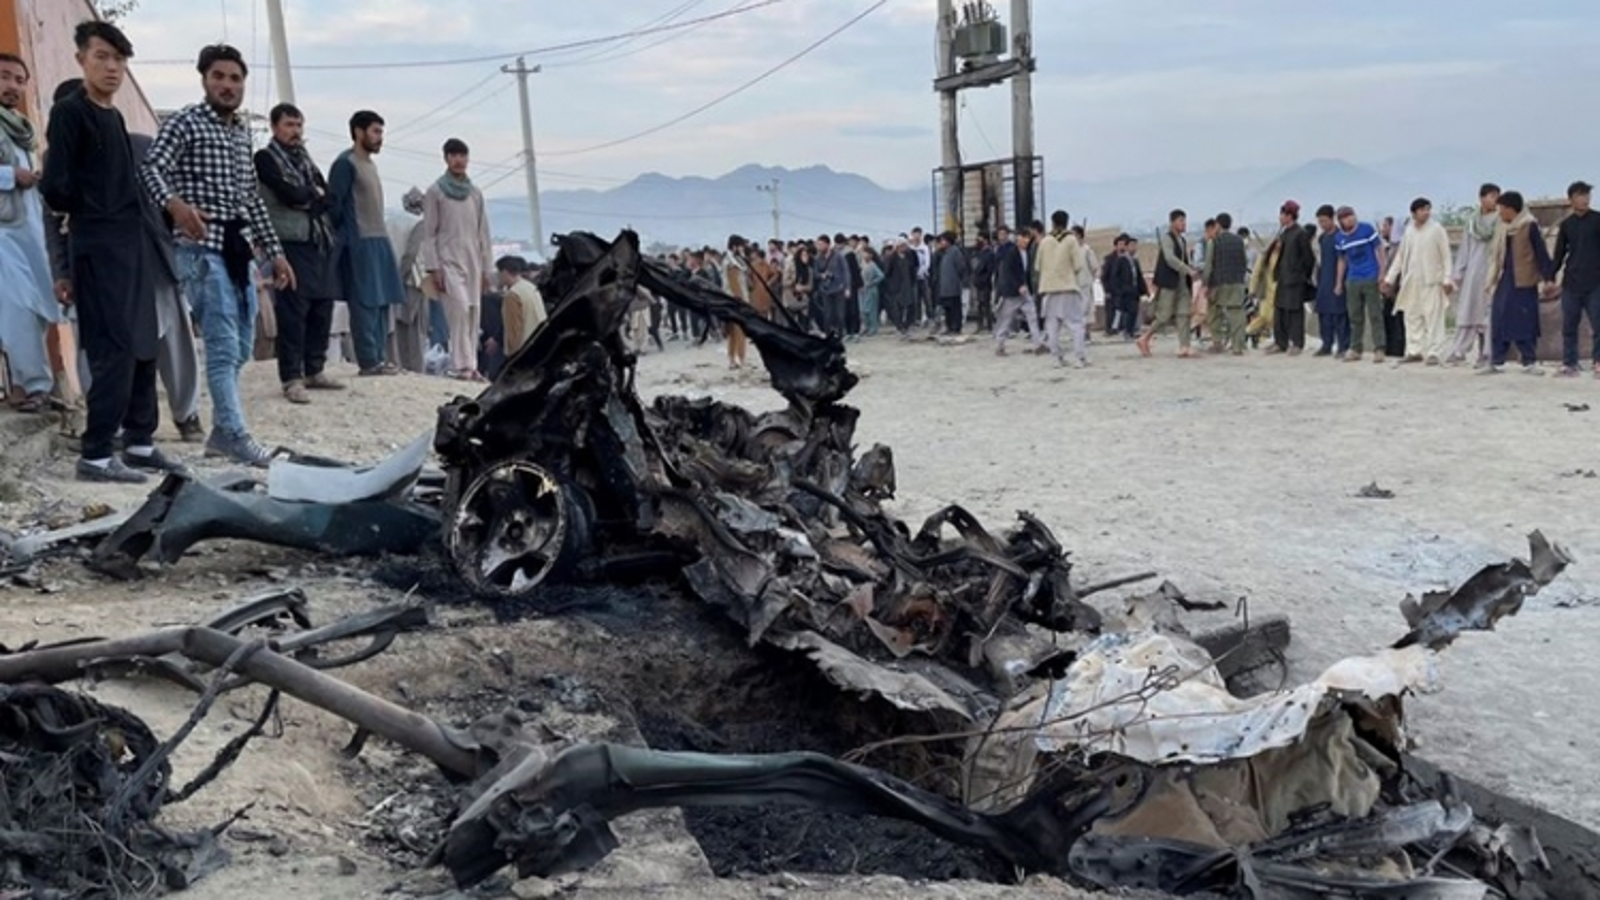 Afghanistantrải qua tuần lễ bạo lực tồi tệ